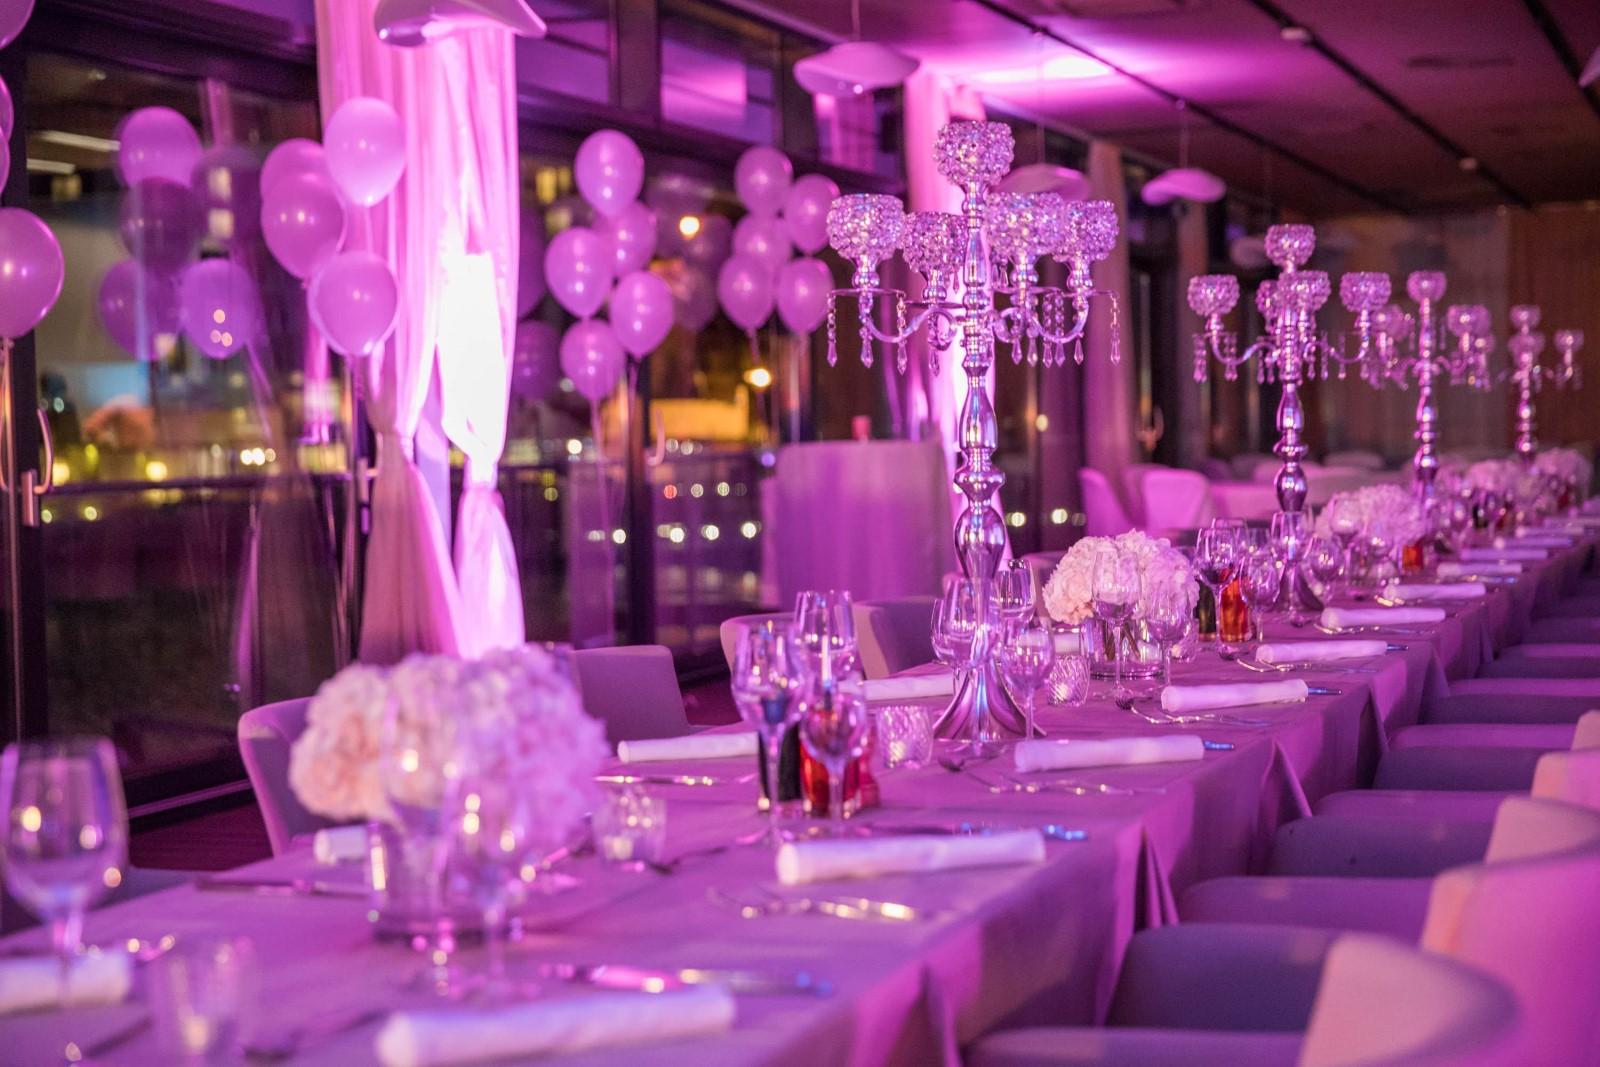 cutlery on wedding table